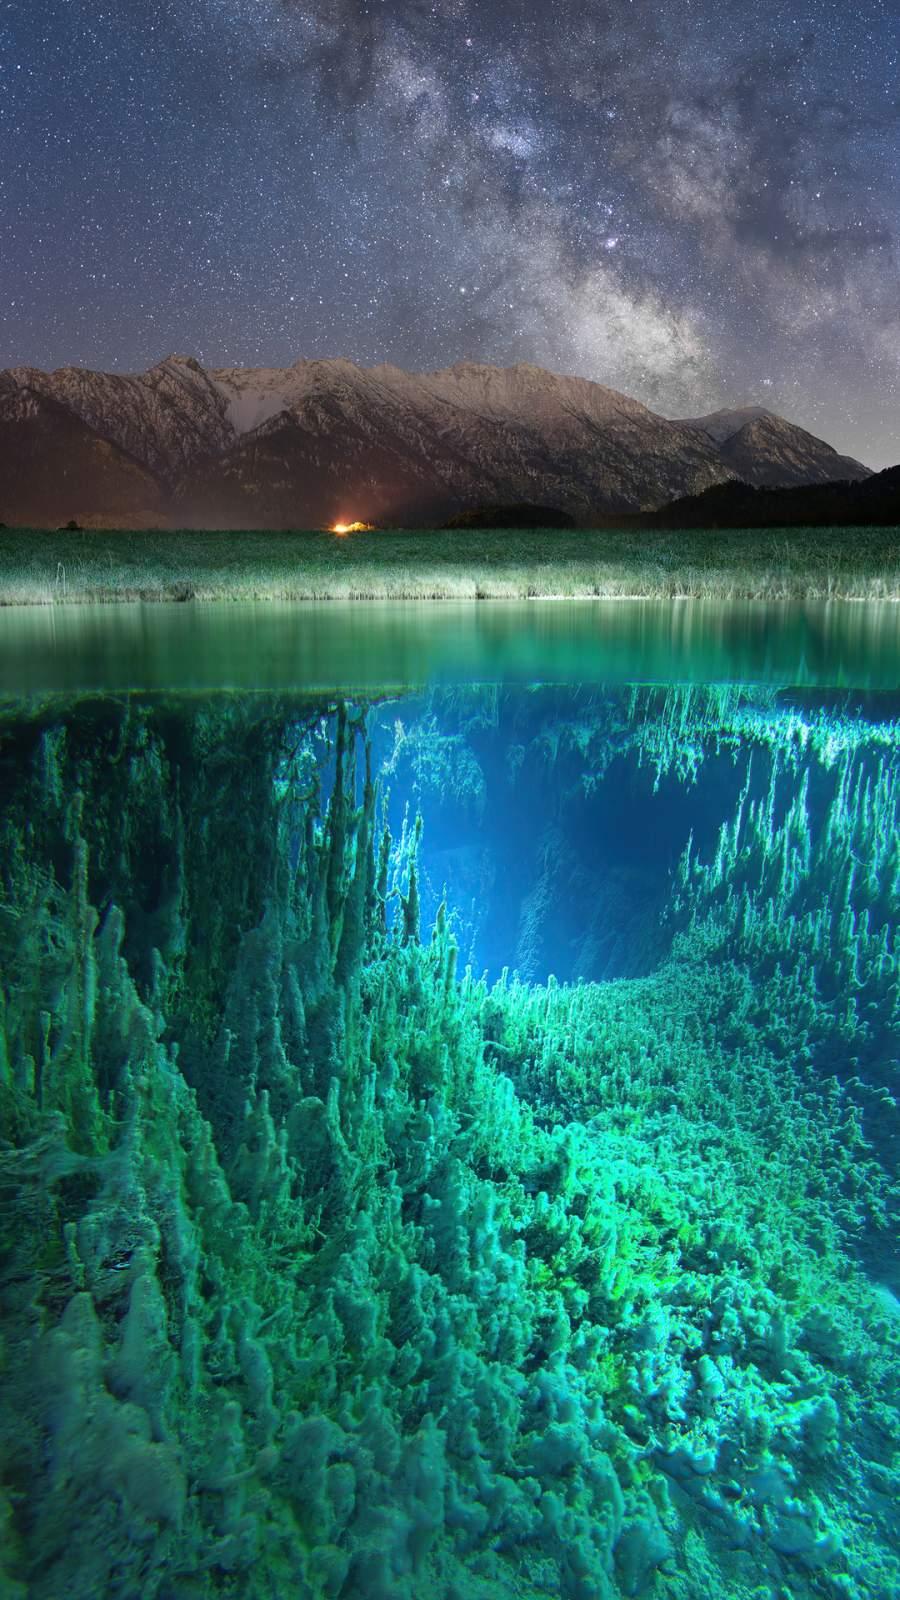 Milkyway Underwater 4K